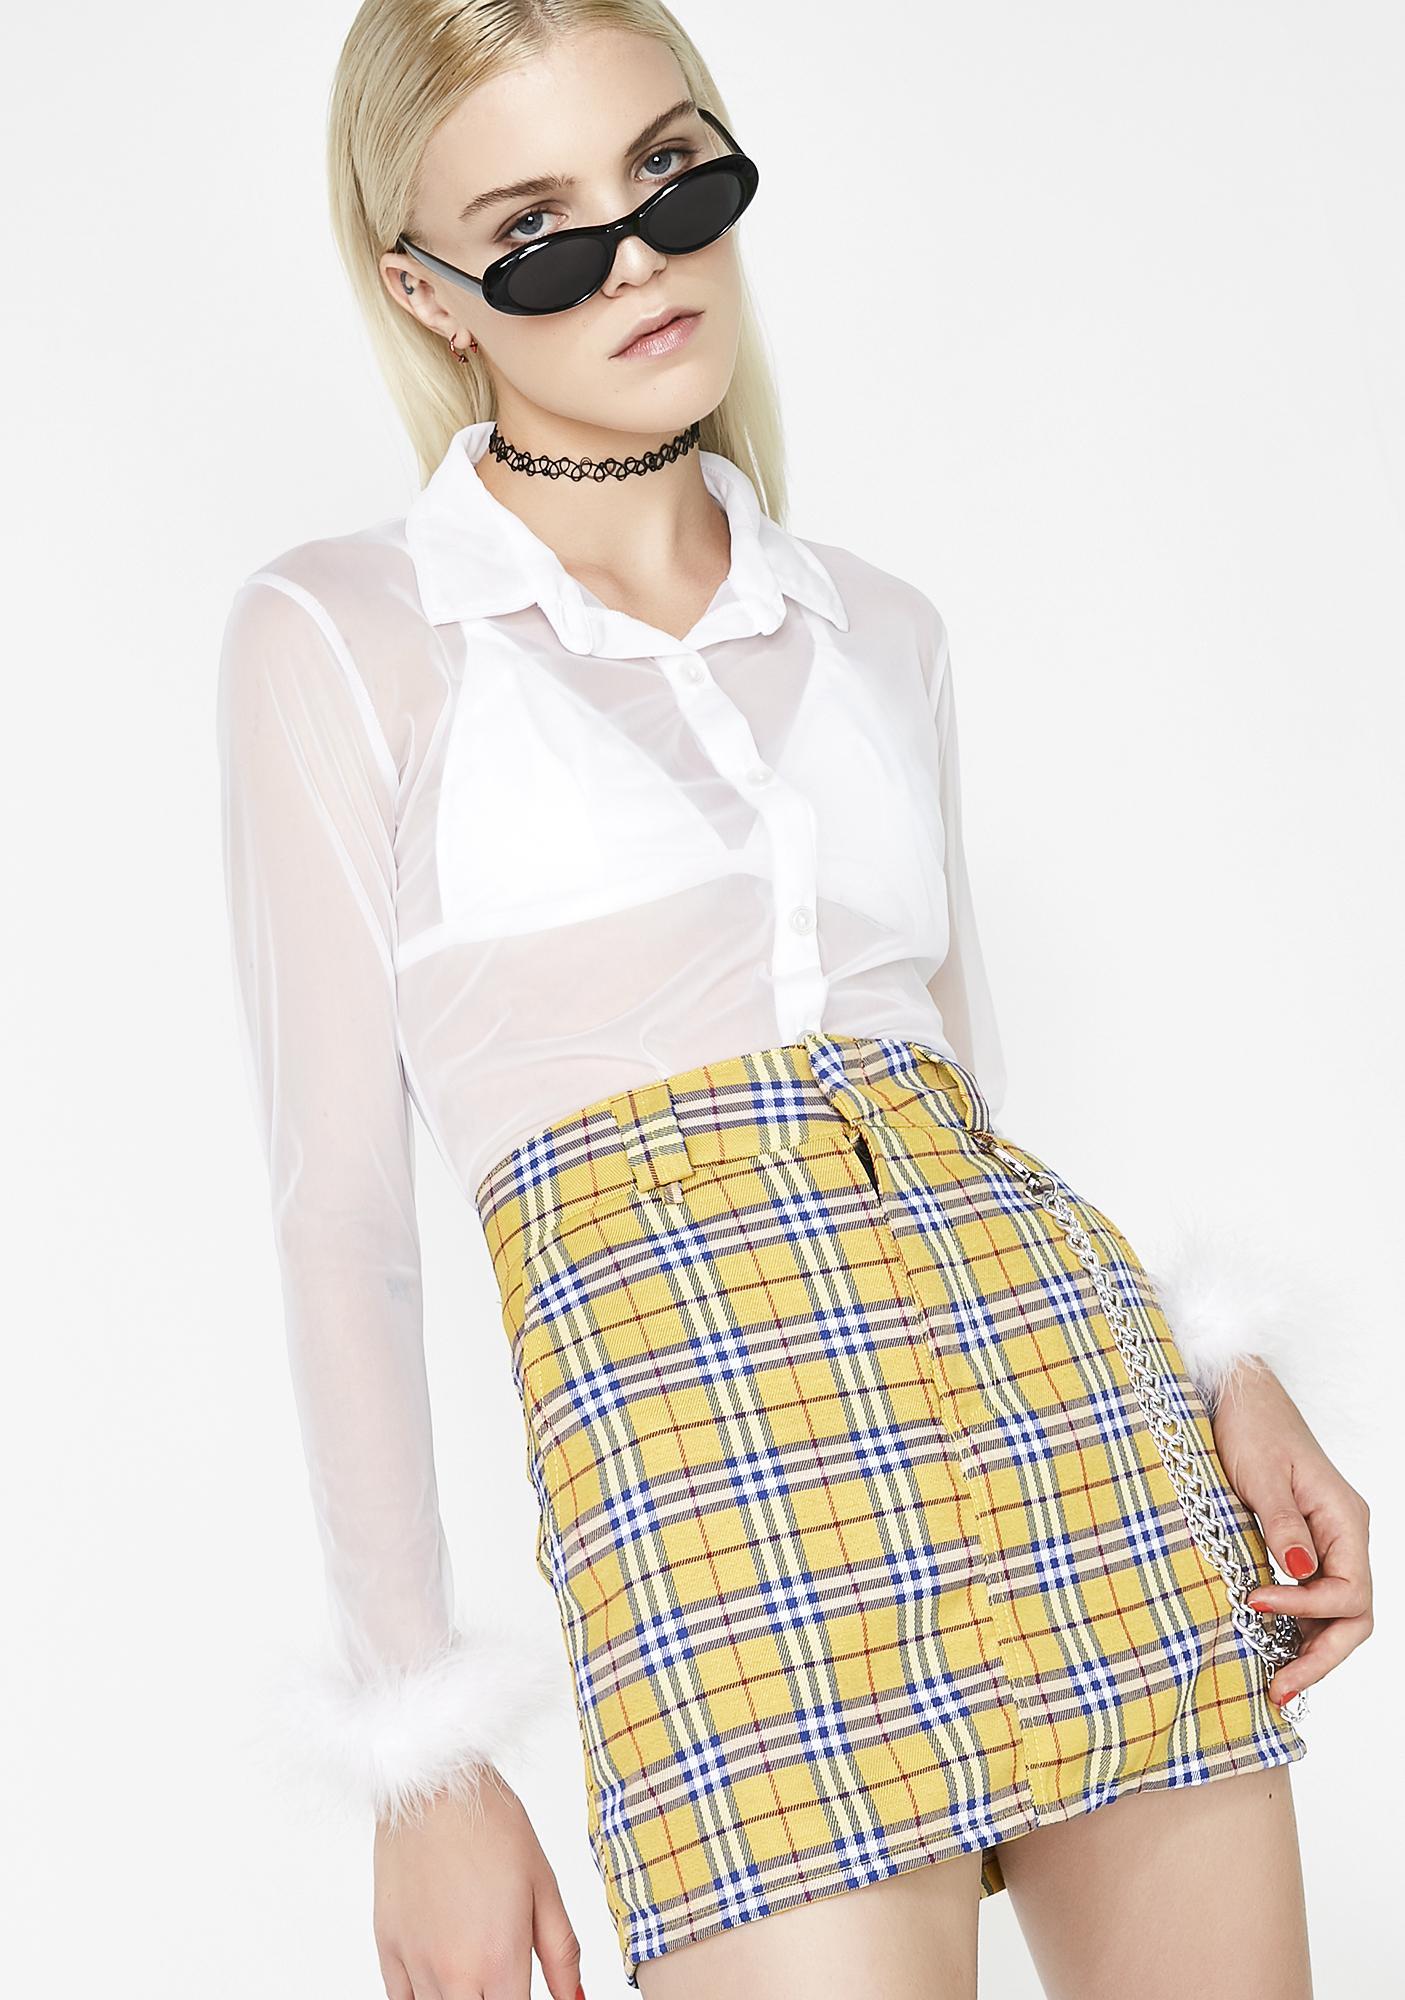 O Mighty Clueless Chain Skirt